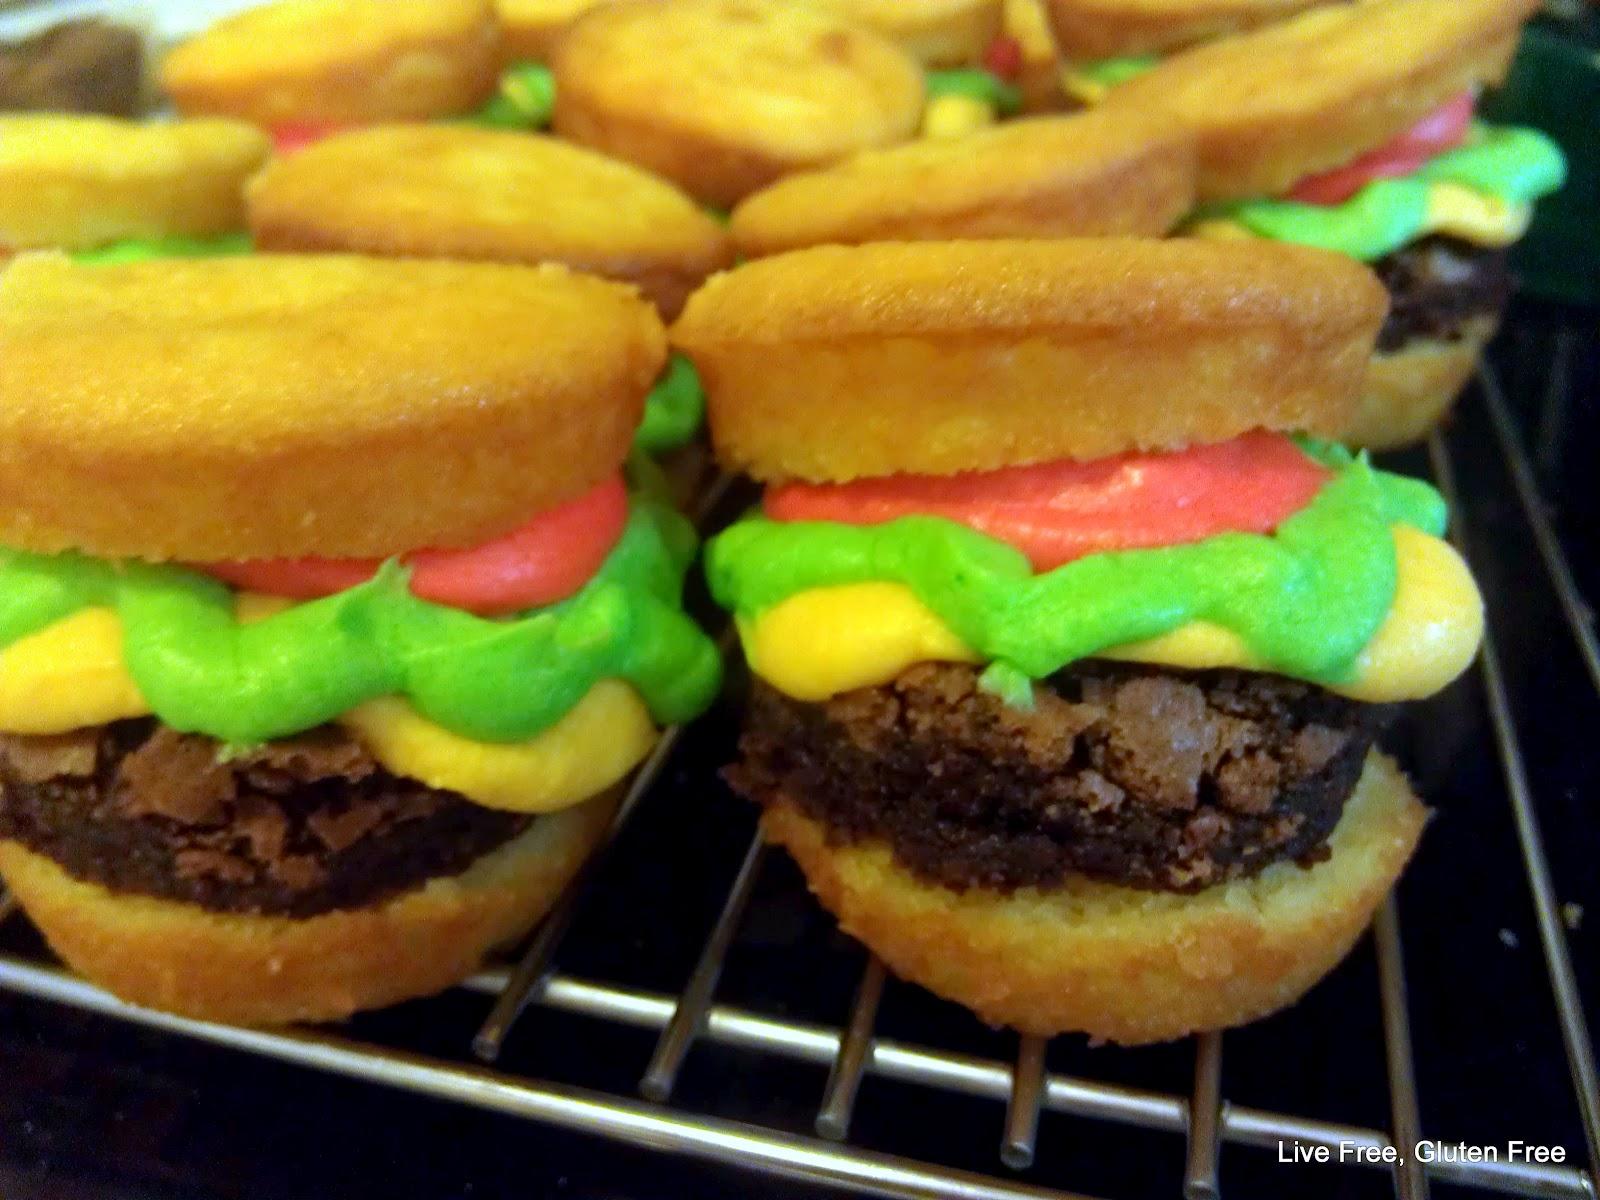 Live Free Gluten Free Cake Ideas